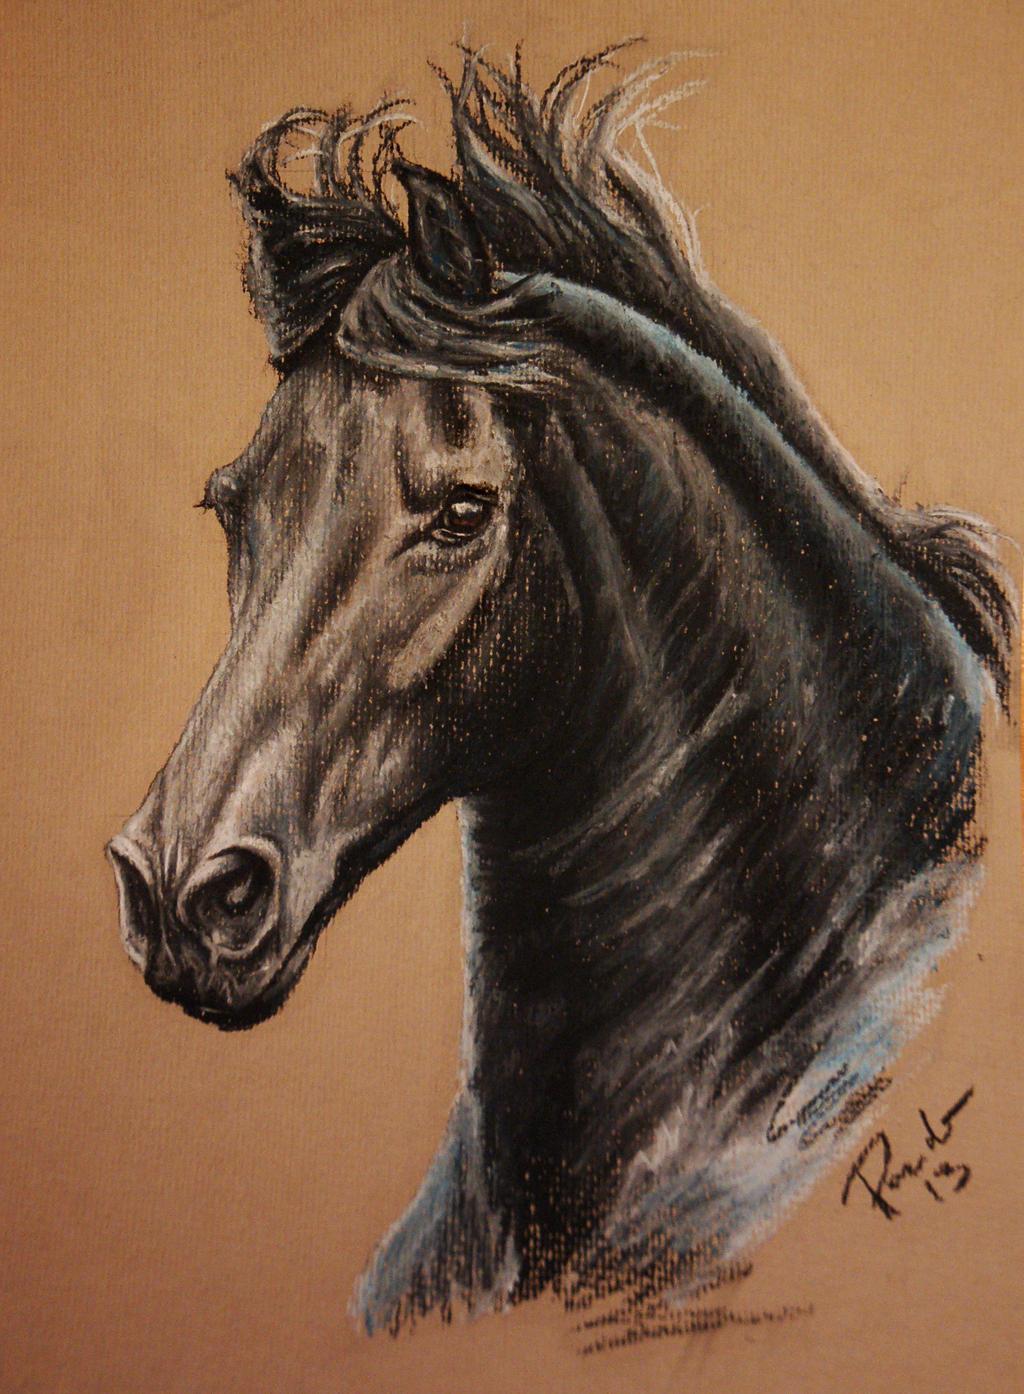 Frisean horse by NutLu